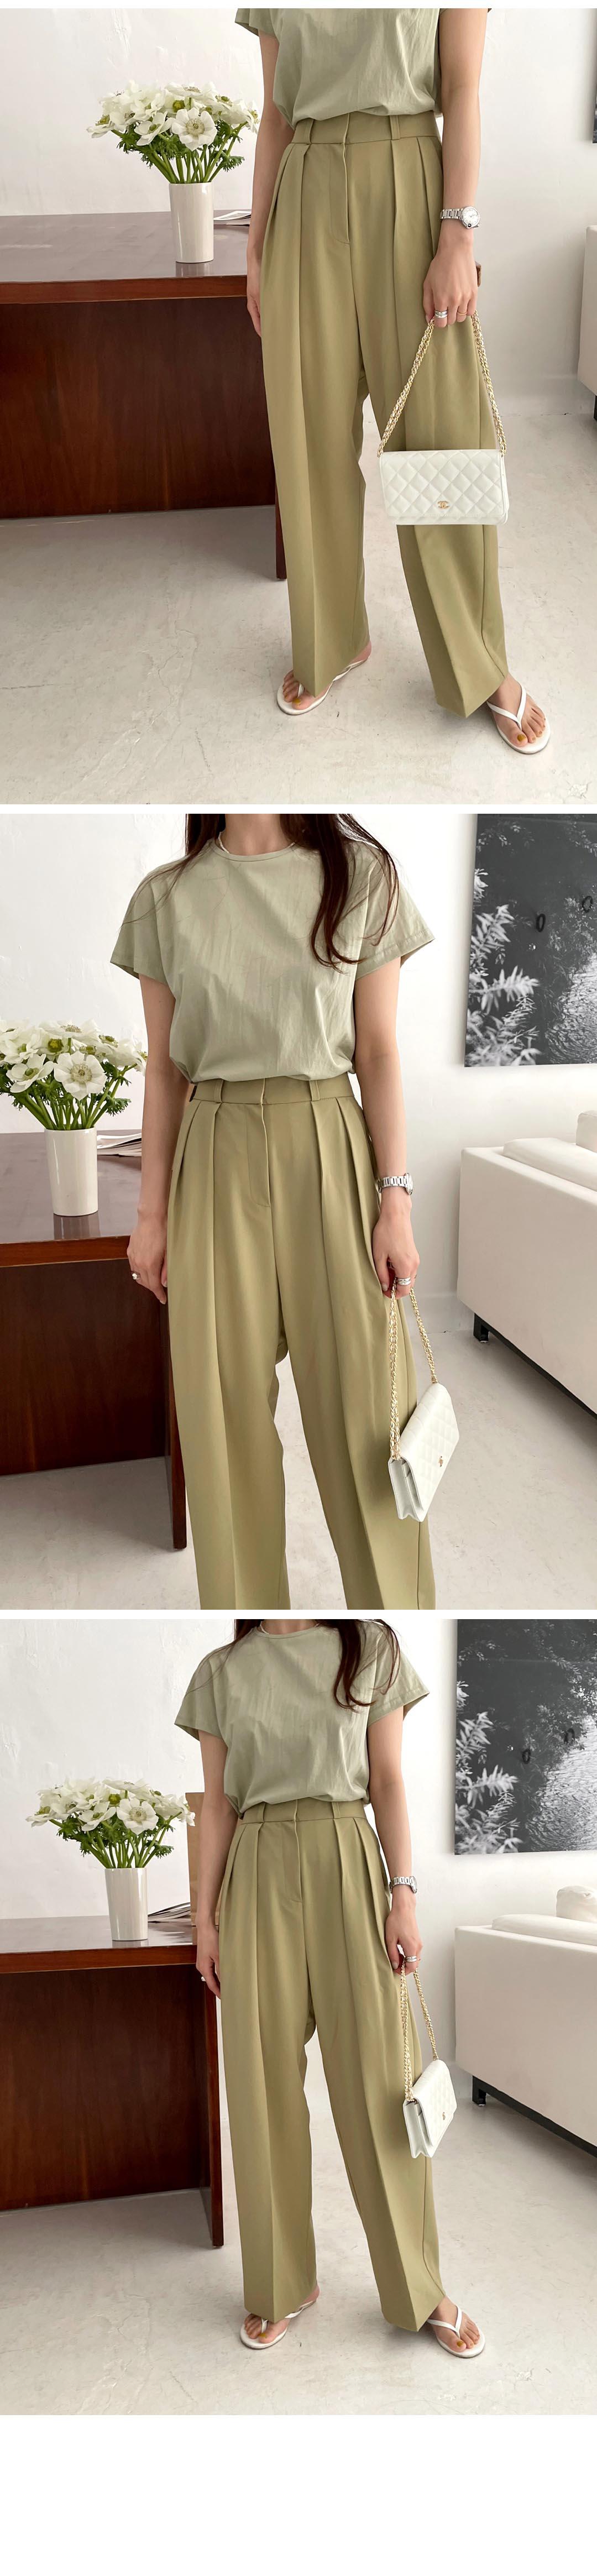 H7041b2e5e5754a4cb368ac86e92970383 - Summer Korean High Waist Loose Folds Wide Leg Solid Suit Pants